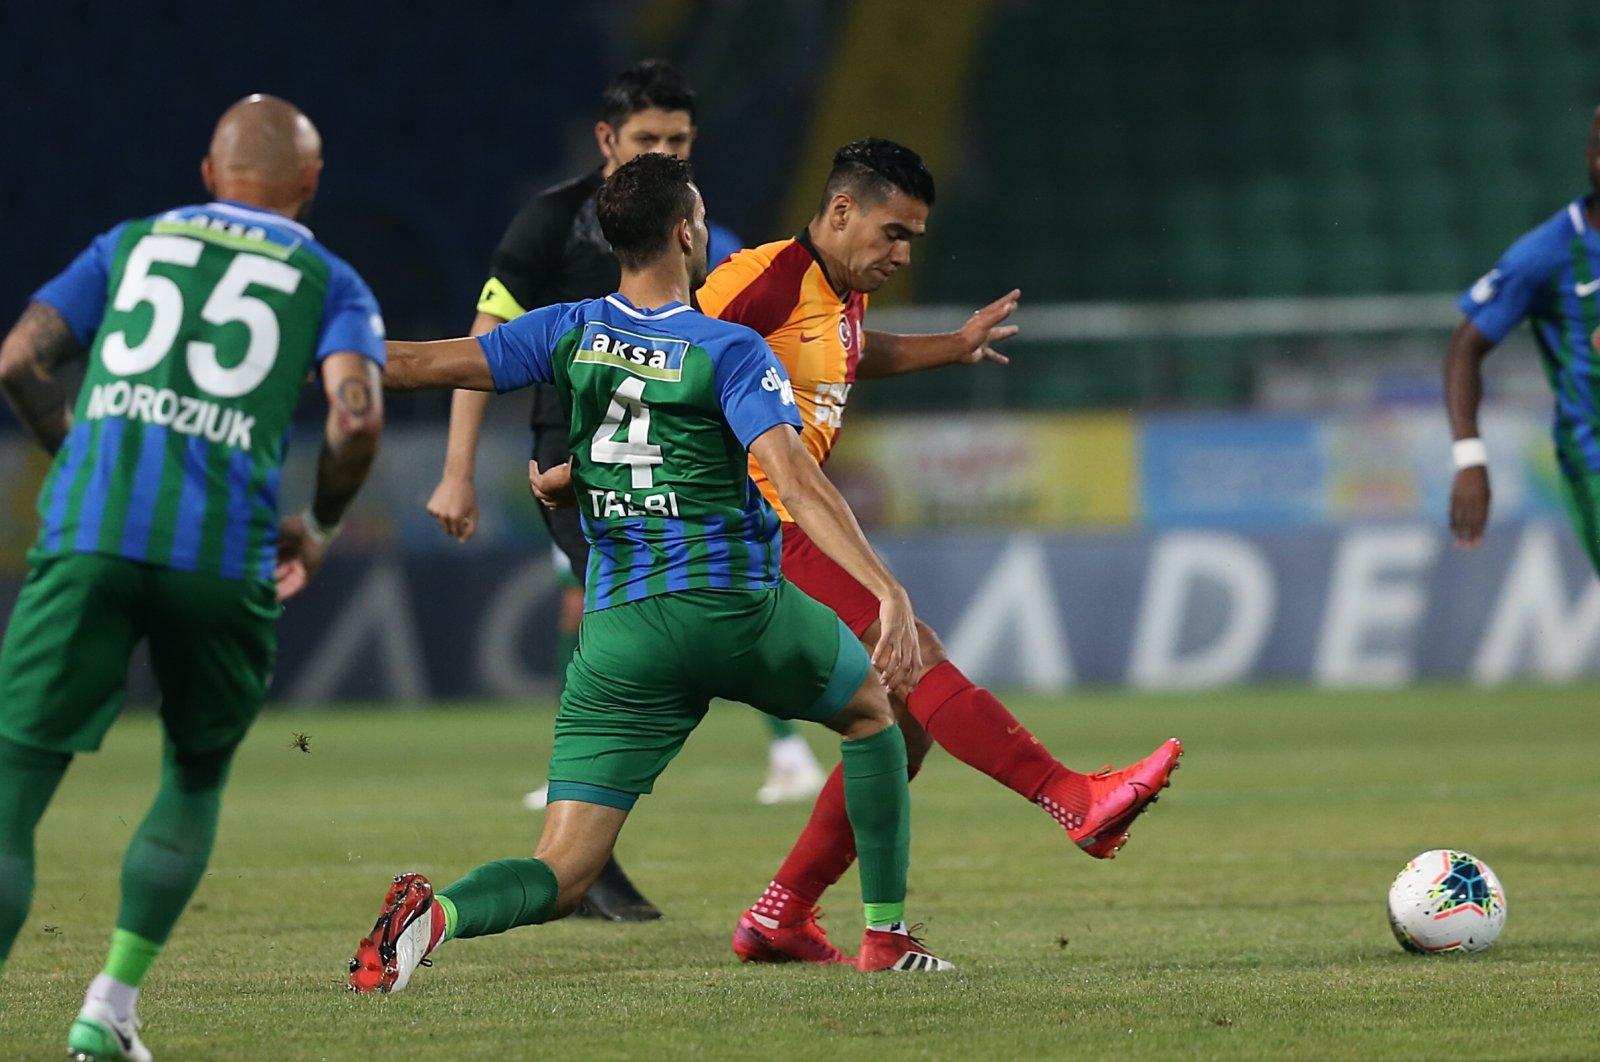 Galatasaray's Radamel Falcao tries to pass the ball between Rizespor players, Rize, Turkey, June 14, 2020. (AA Photo)